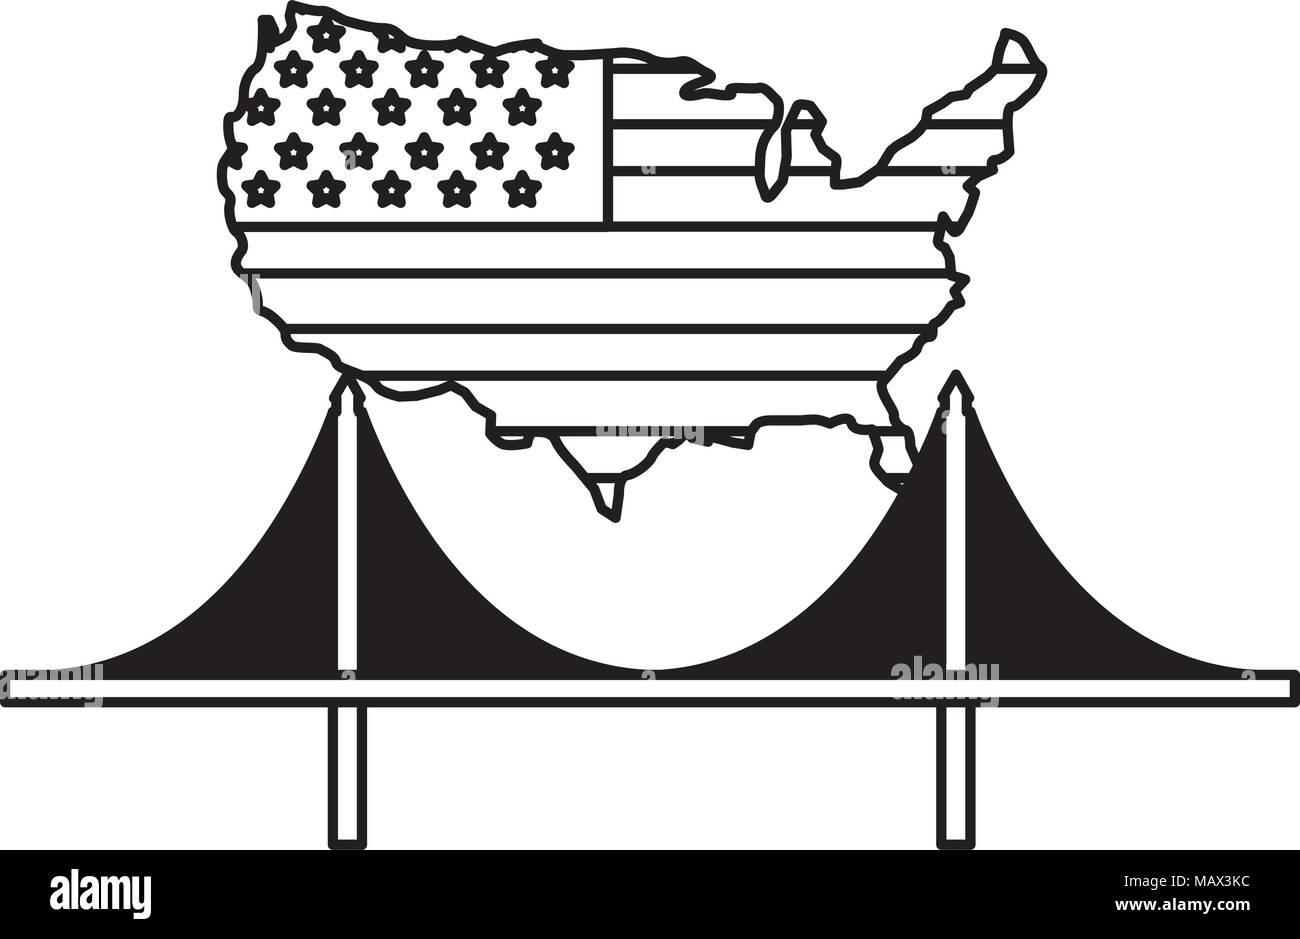 american flag on map and bridge landmark - Stock Image